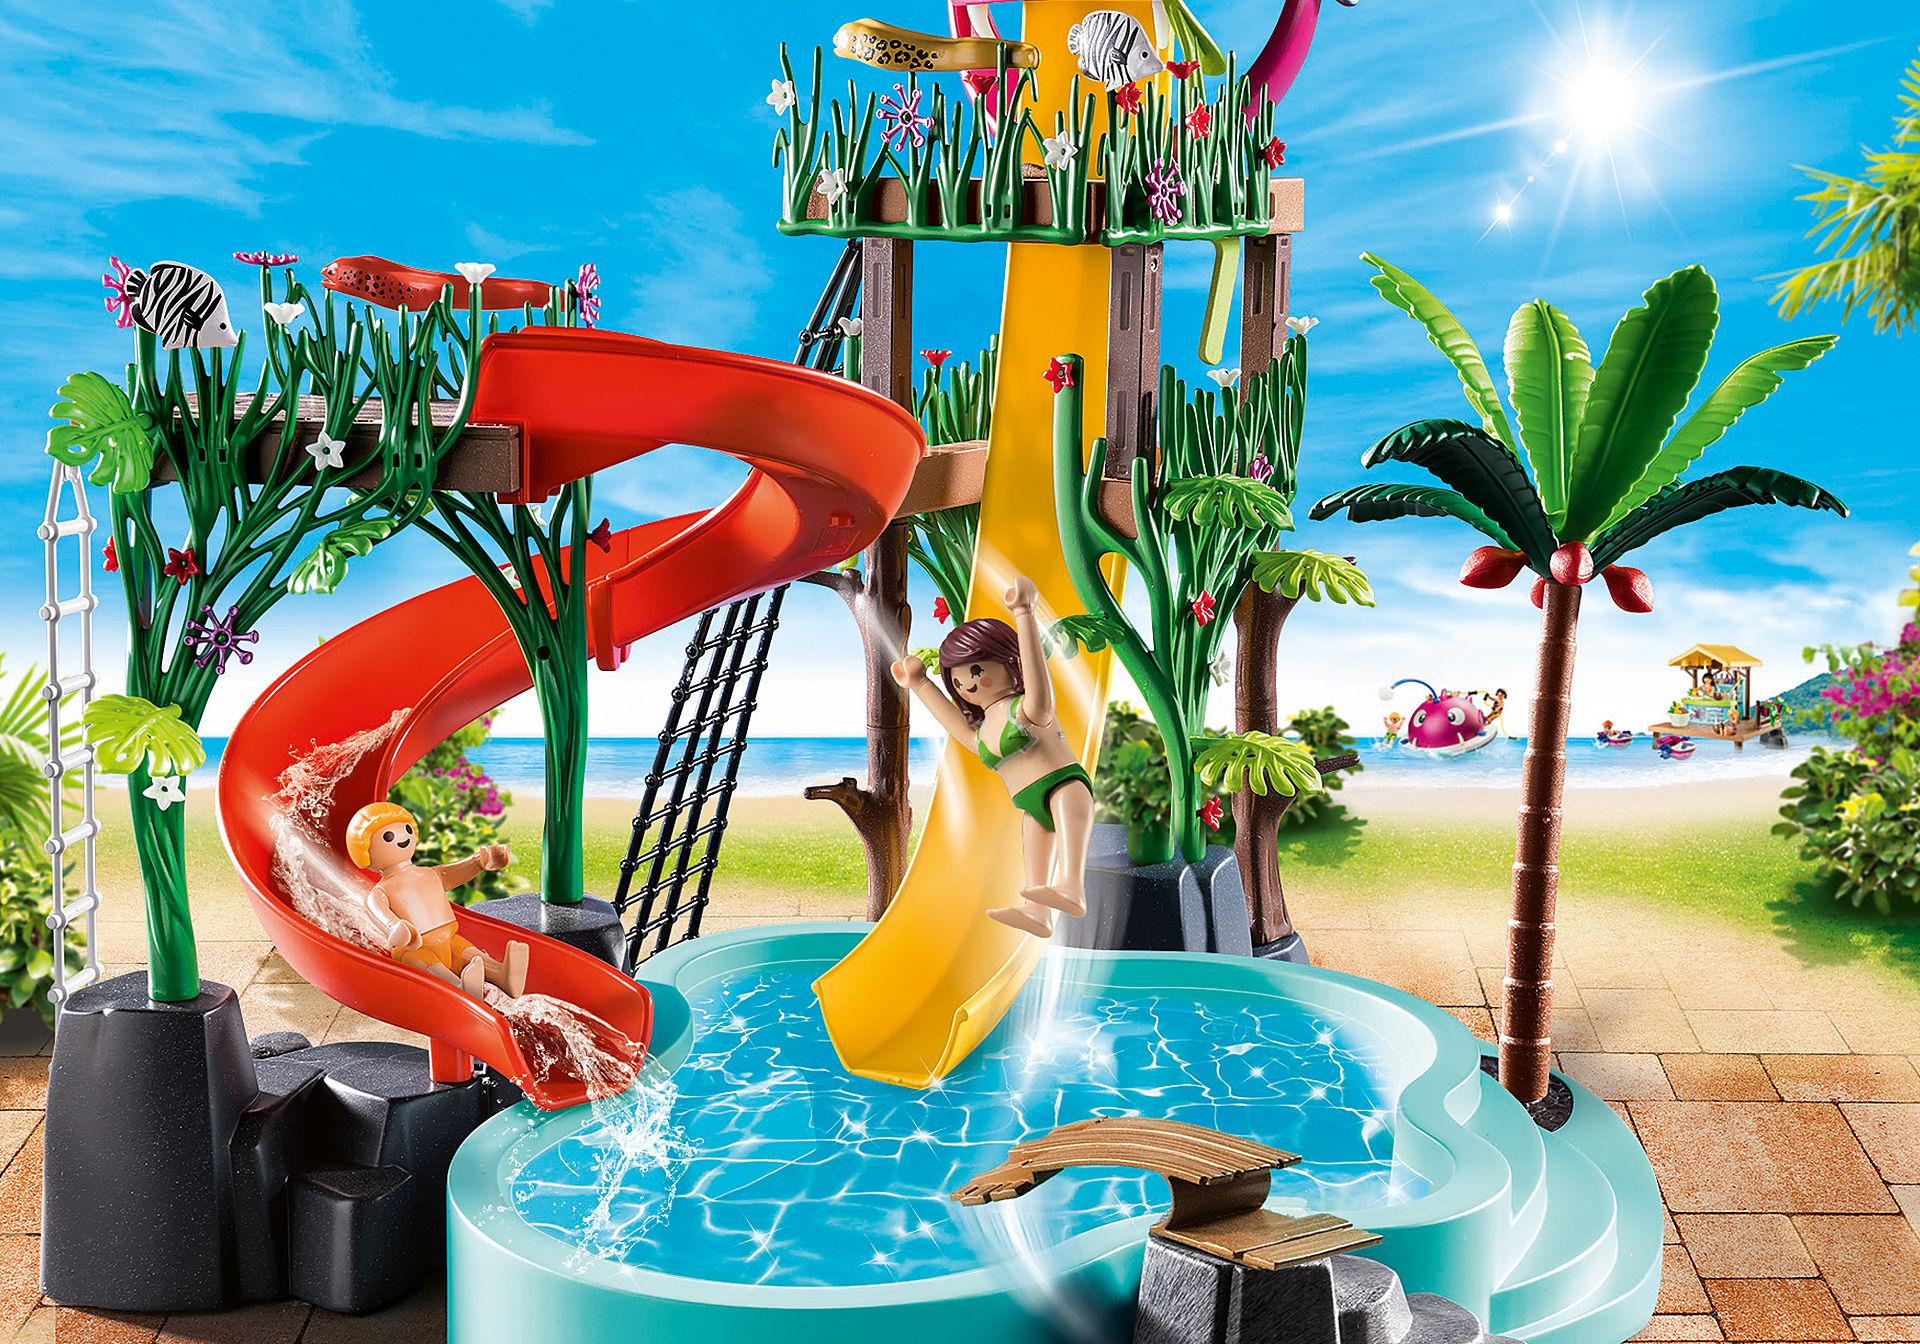 70609 Aqua Park med rutschkanor zoom image4